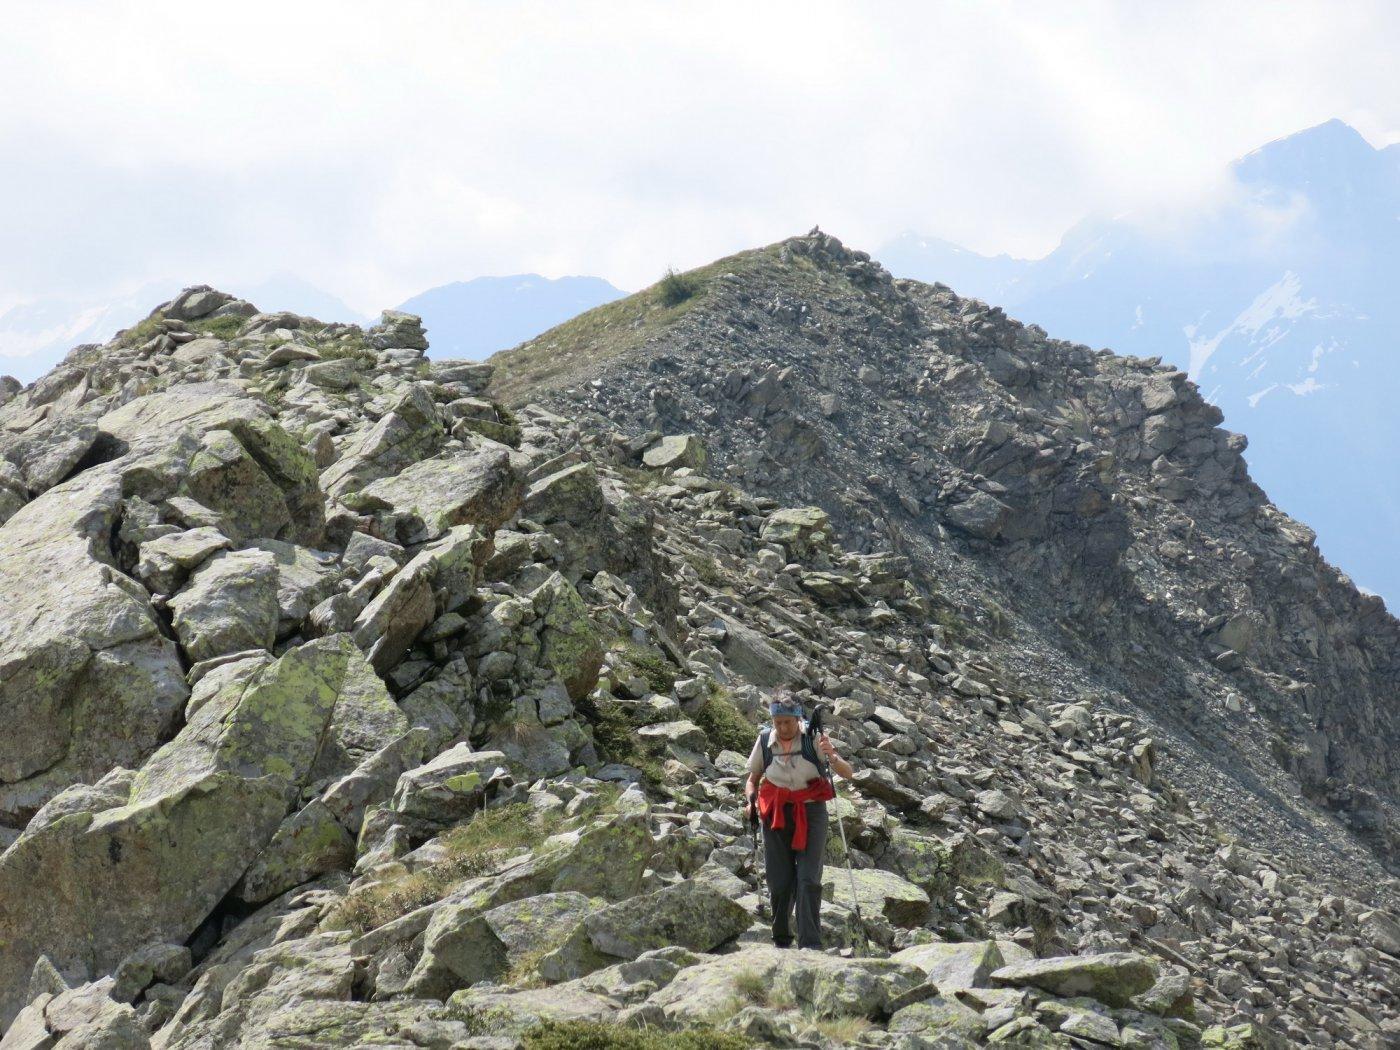 Raty (Bec), Mont Ros da Mont Blanc, anello per i Laghi Vernouille e Raty 2015-07-08